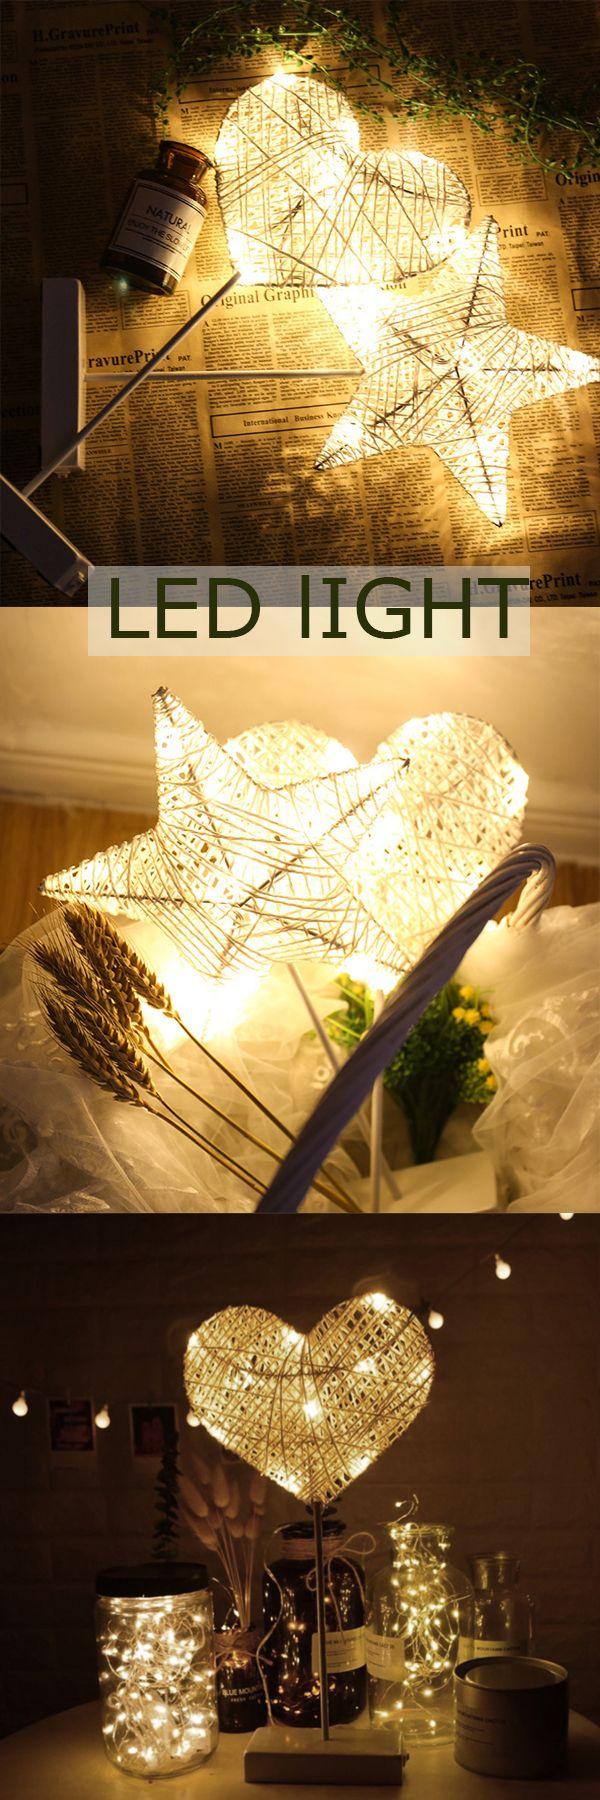 US$12.99 LED Night Light Star Heart Shape Decorative Lightings Home Christmas Party Romantic Decor #newchic#home#LED#light#decor